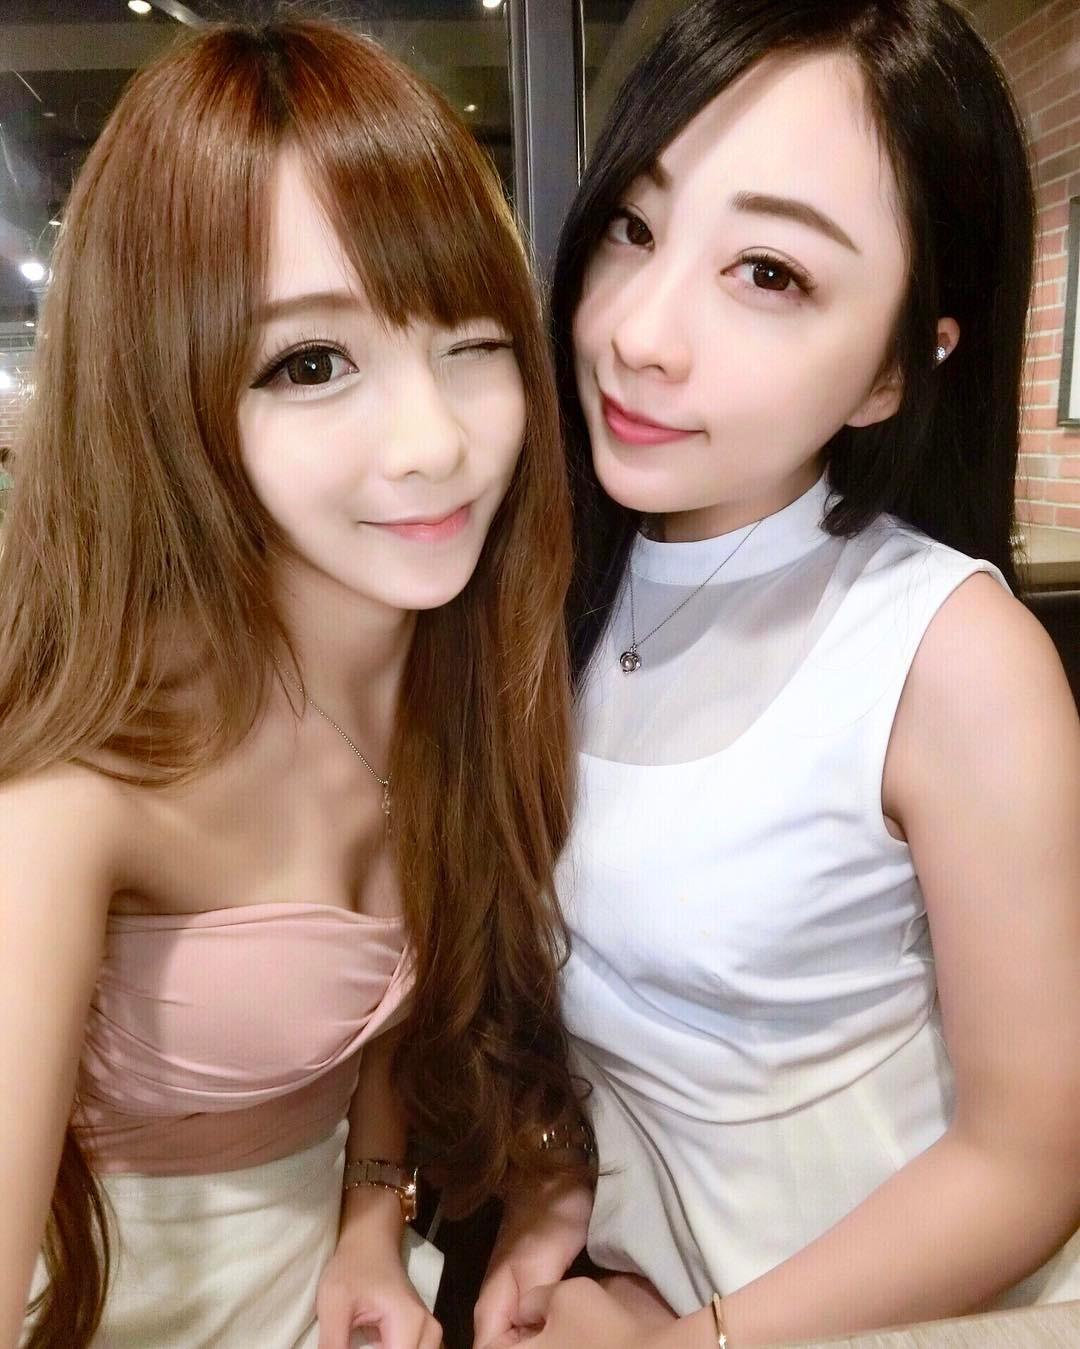 lkk_chu_20902172_833210310186801_551036362682269696_n